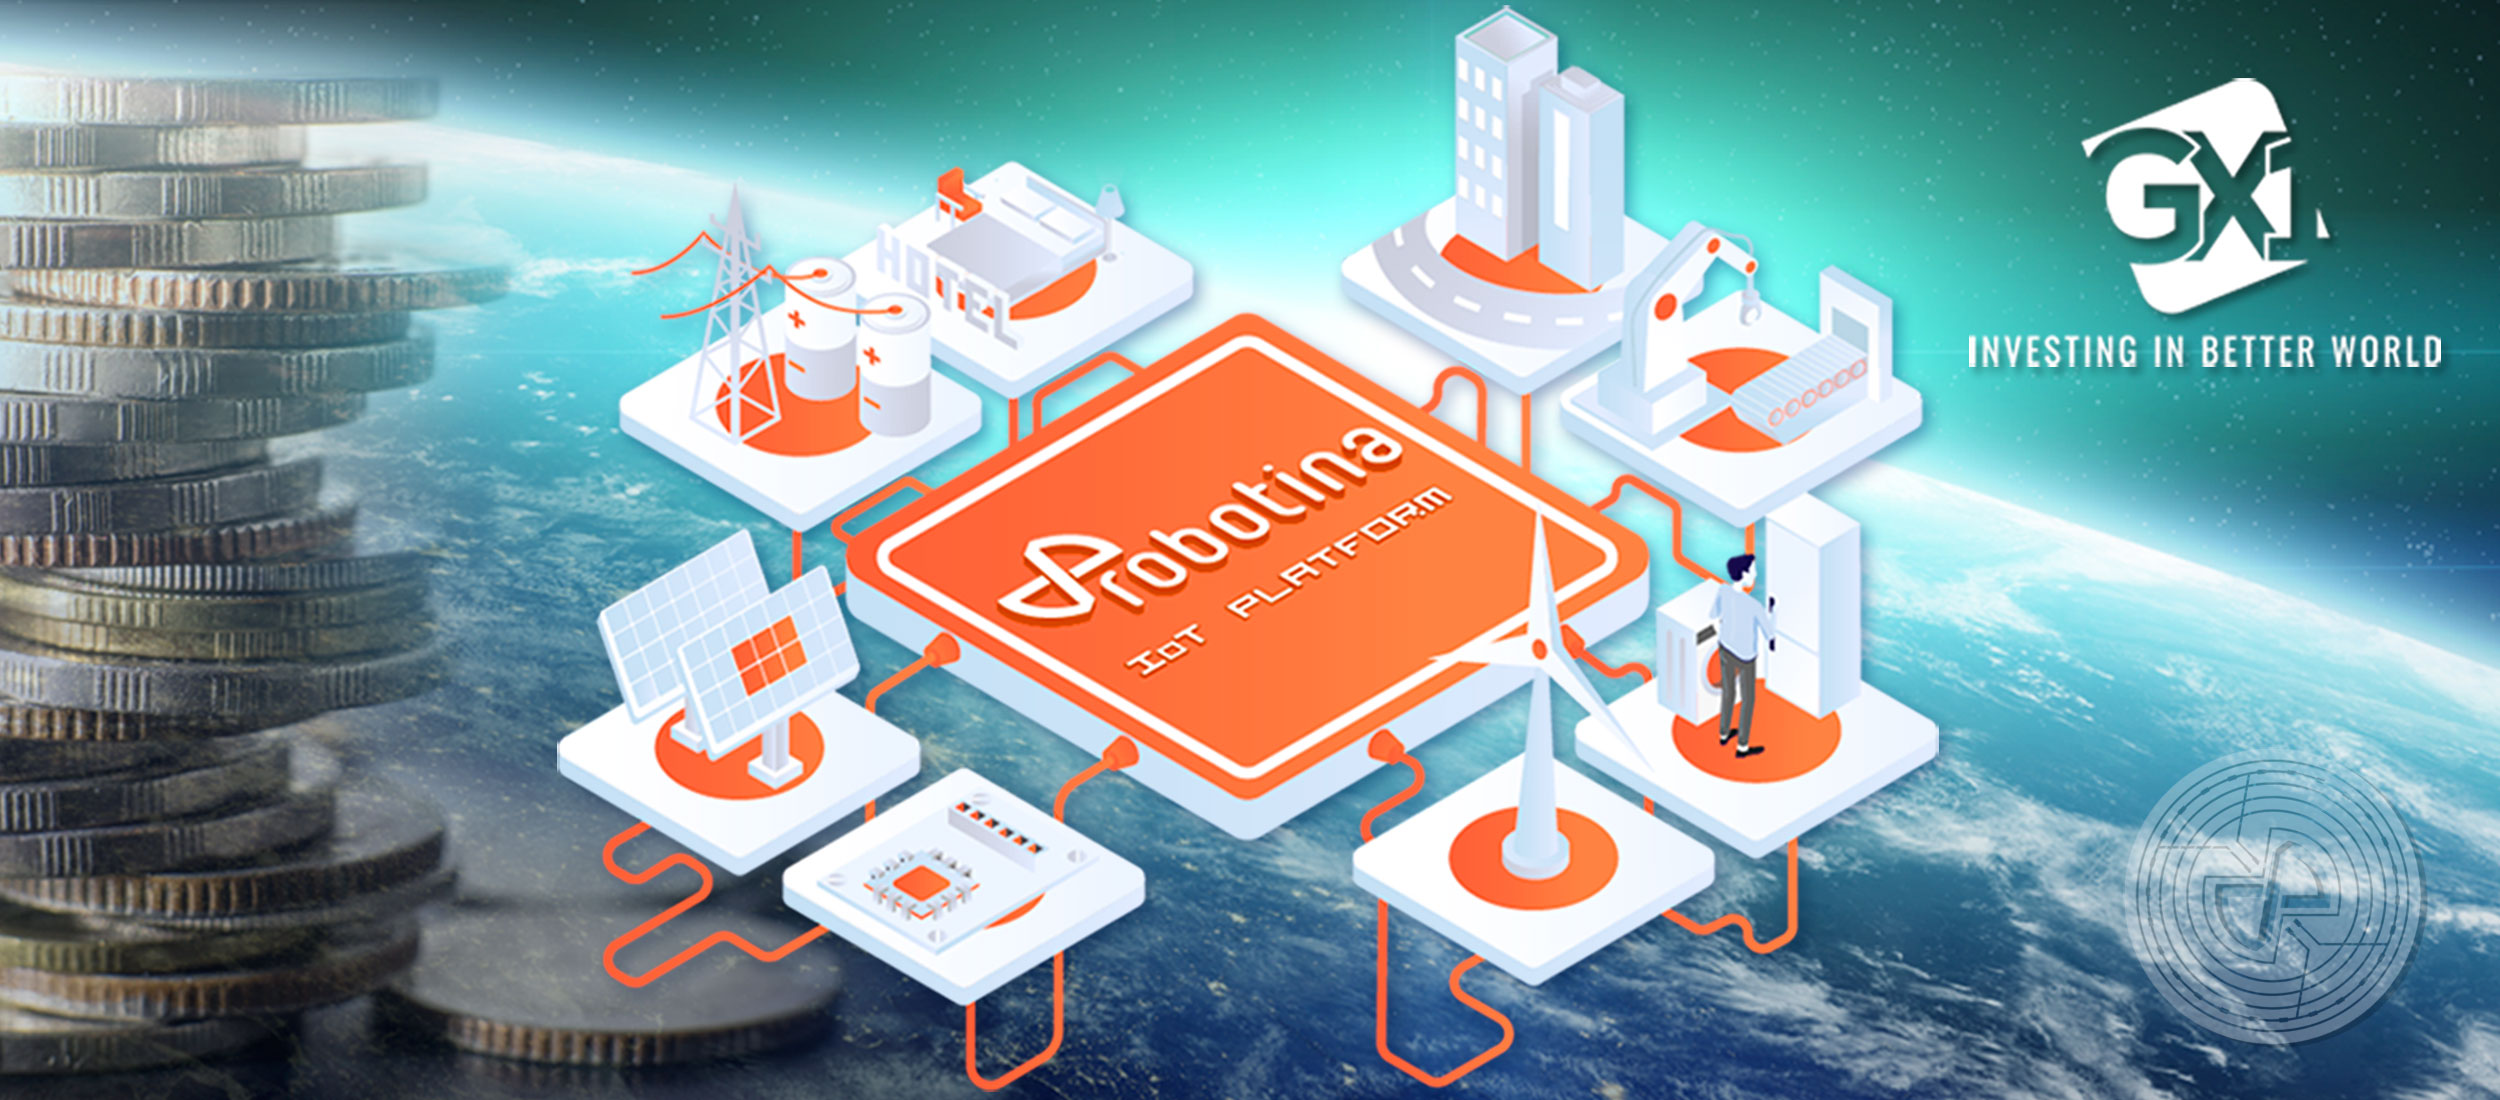 U.S. company GX1 invested in Robotina IoT Platform